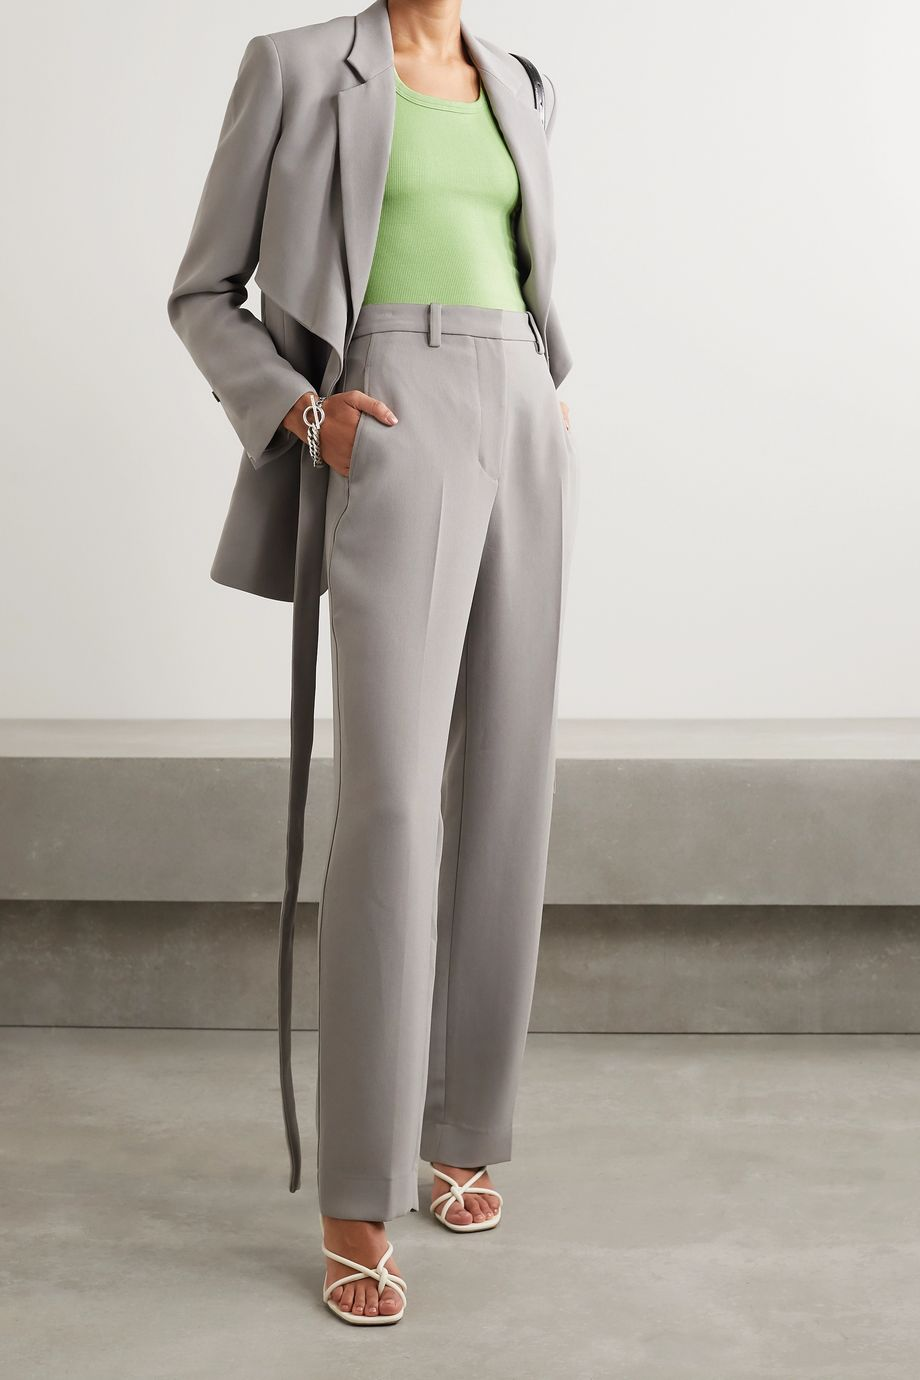 Alix NYC Austin 罗纹弹力莫代尔平纹布连体丁字裤式紧身衣